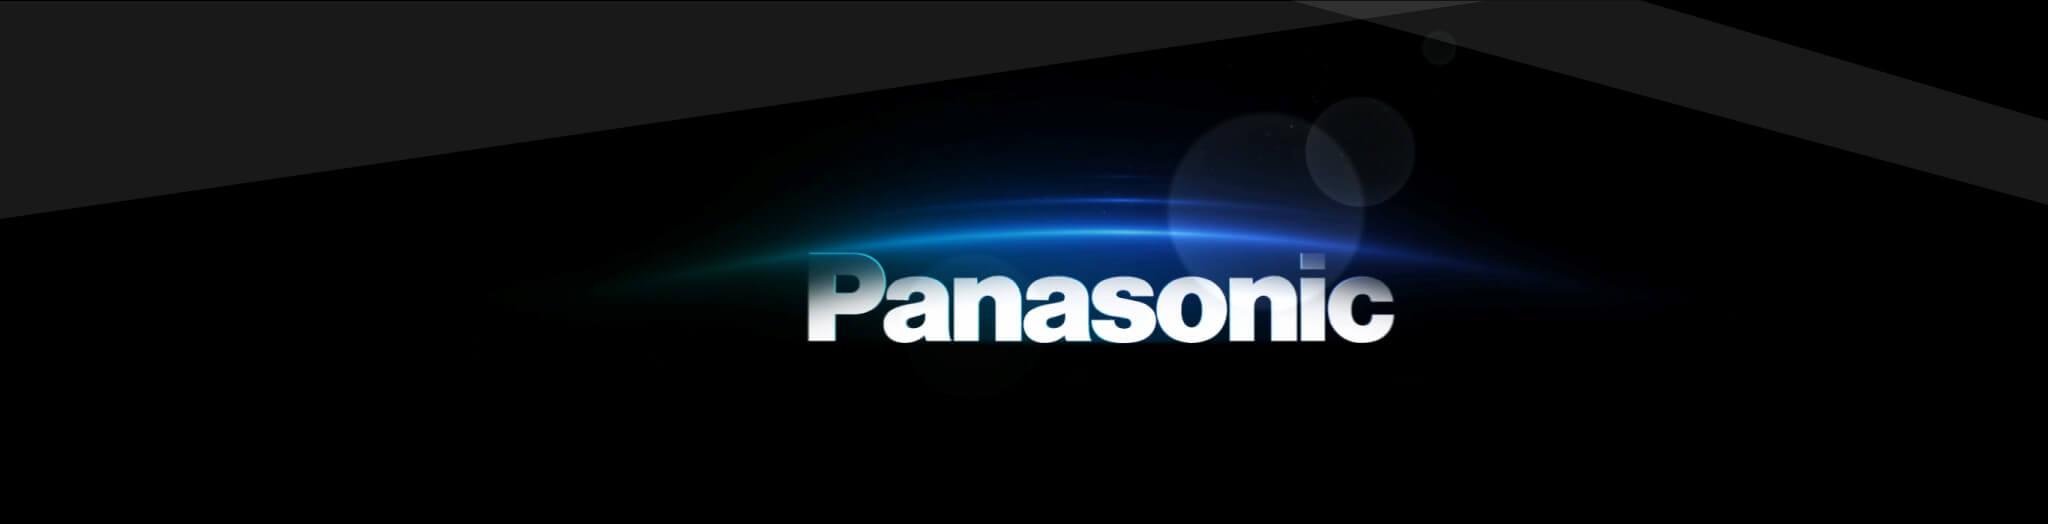 Panasonic Mexico  scanner mayorista